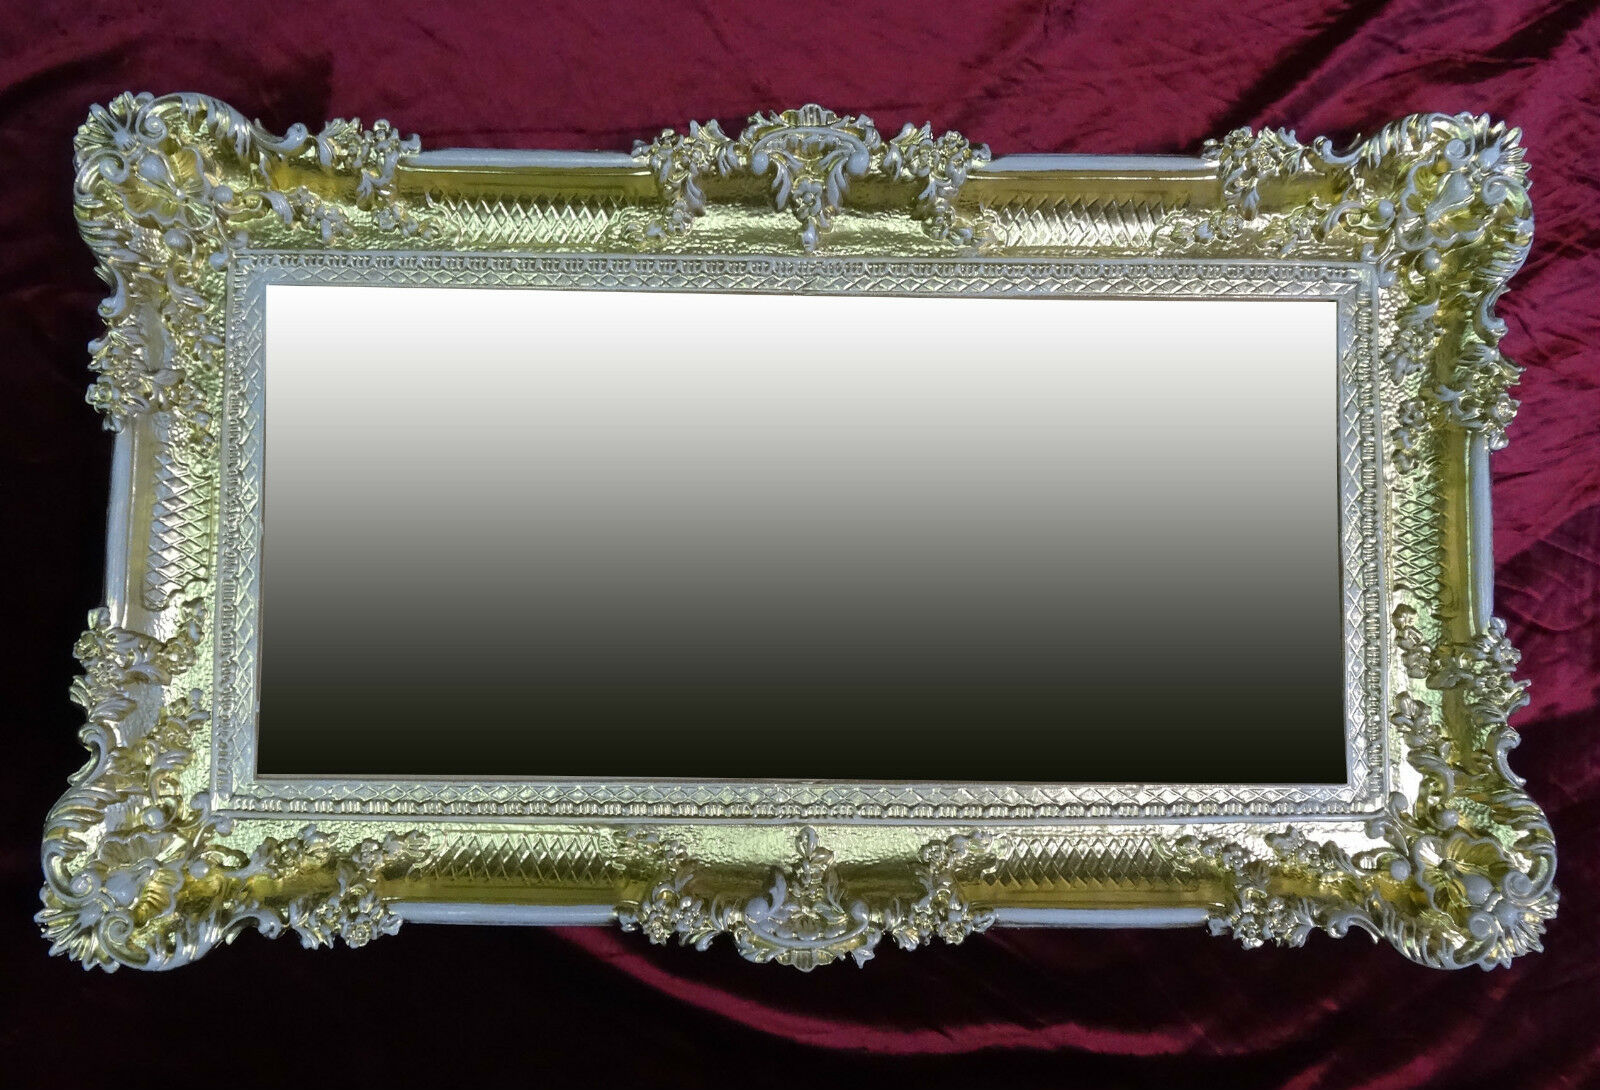 Xxl wall mirror rectangular gold white baroque deco for Rectangular baroque mirror